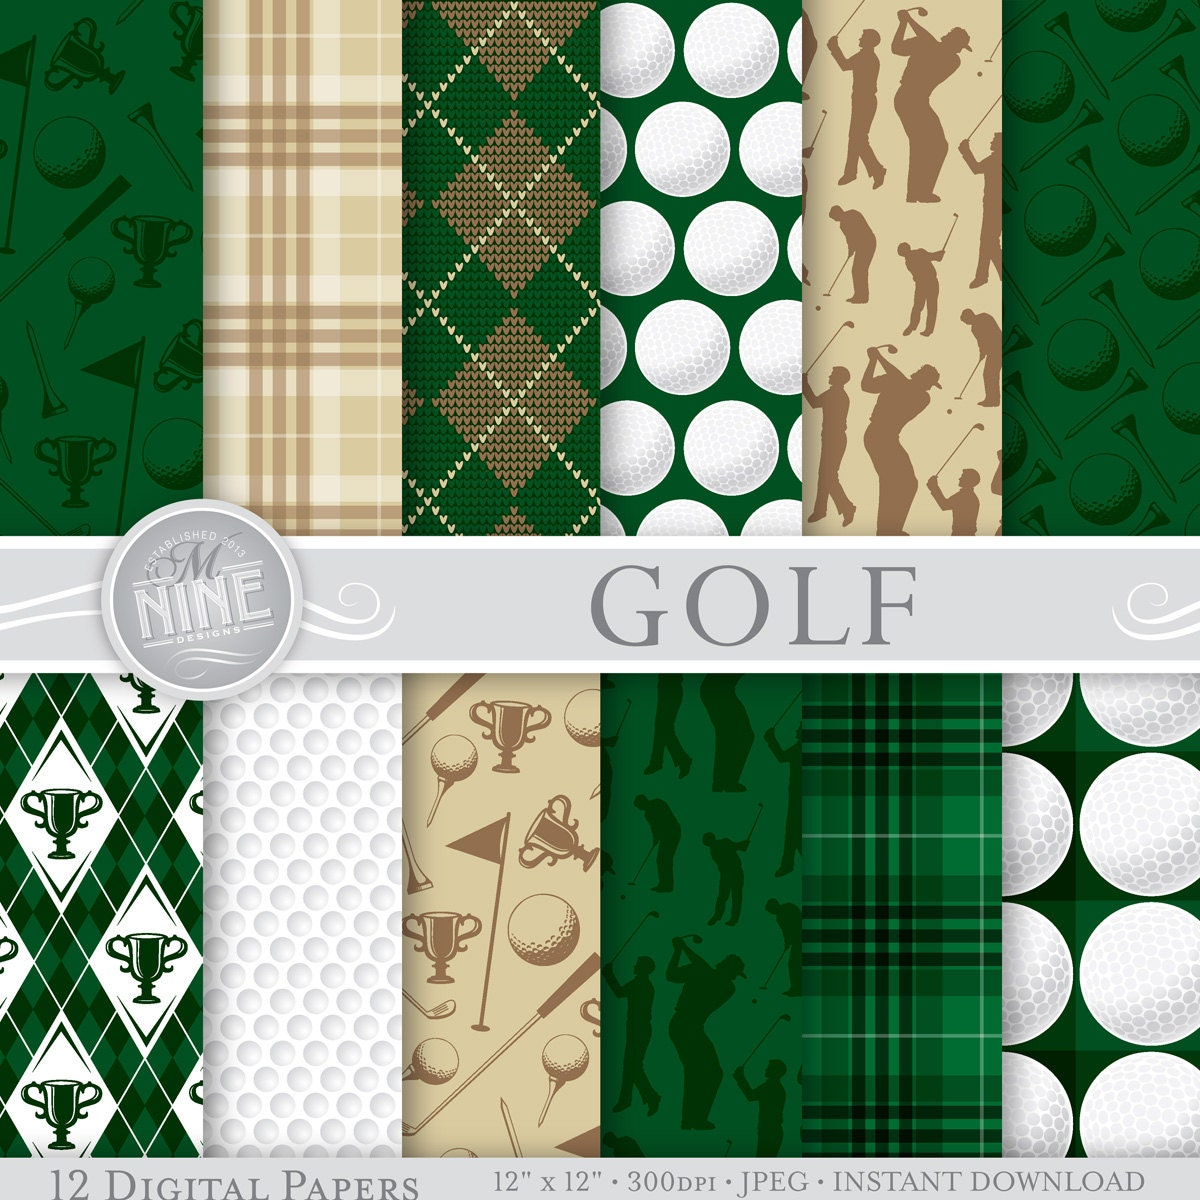 GOLF Theme Digital Paper Pack 12 X SPORTS Pattern Prints Instant Download Patterns Backgrounds Scrapbook Print